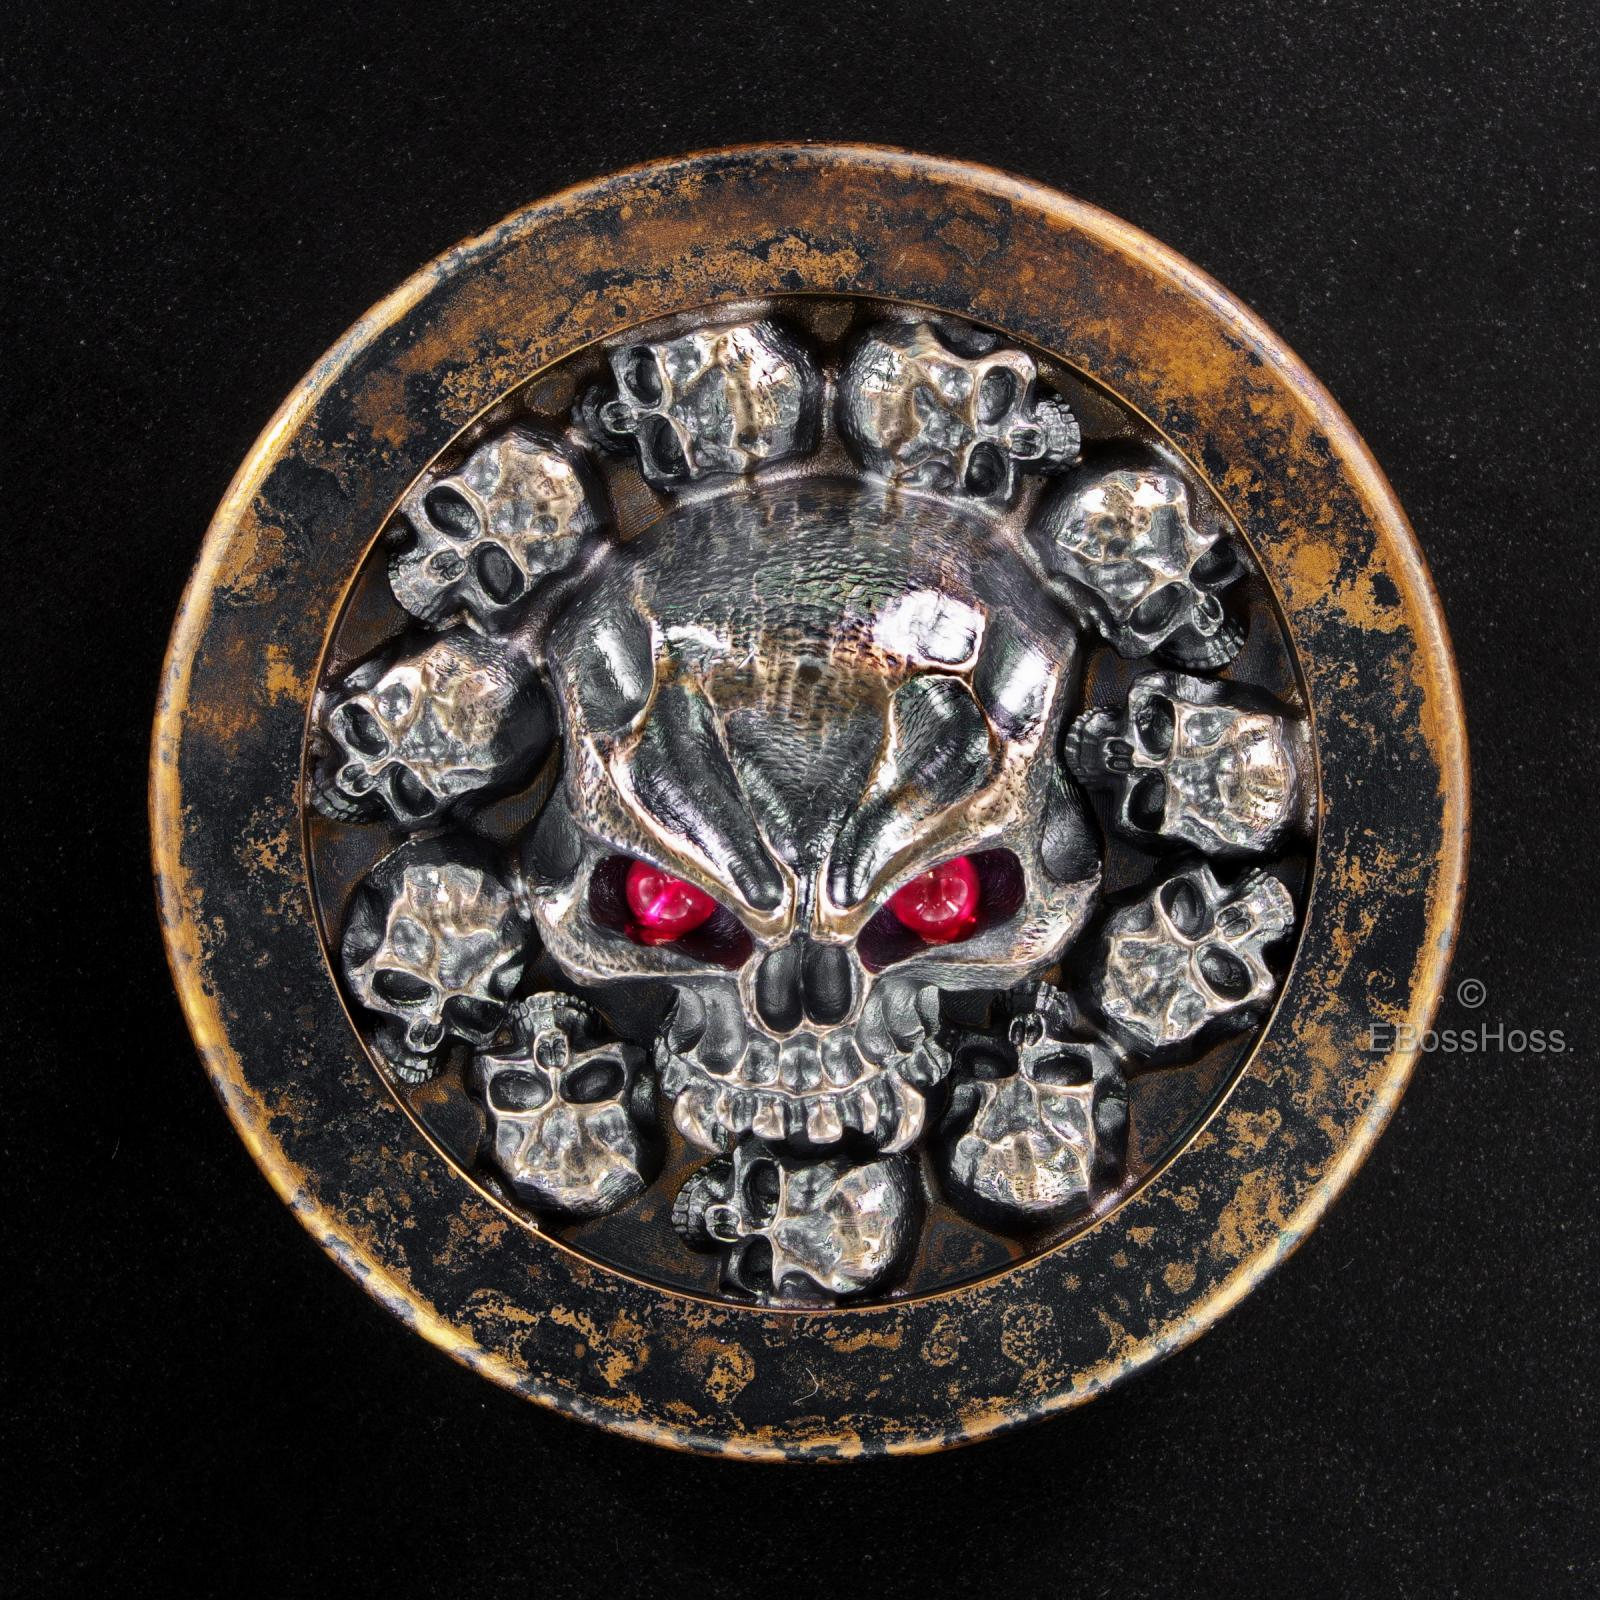 Steel Flame ''ONE'' Vigilant XL Challenge Coin by Derrick Obatake